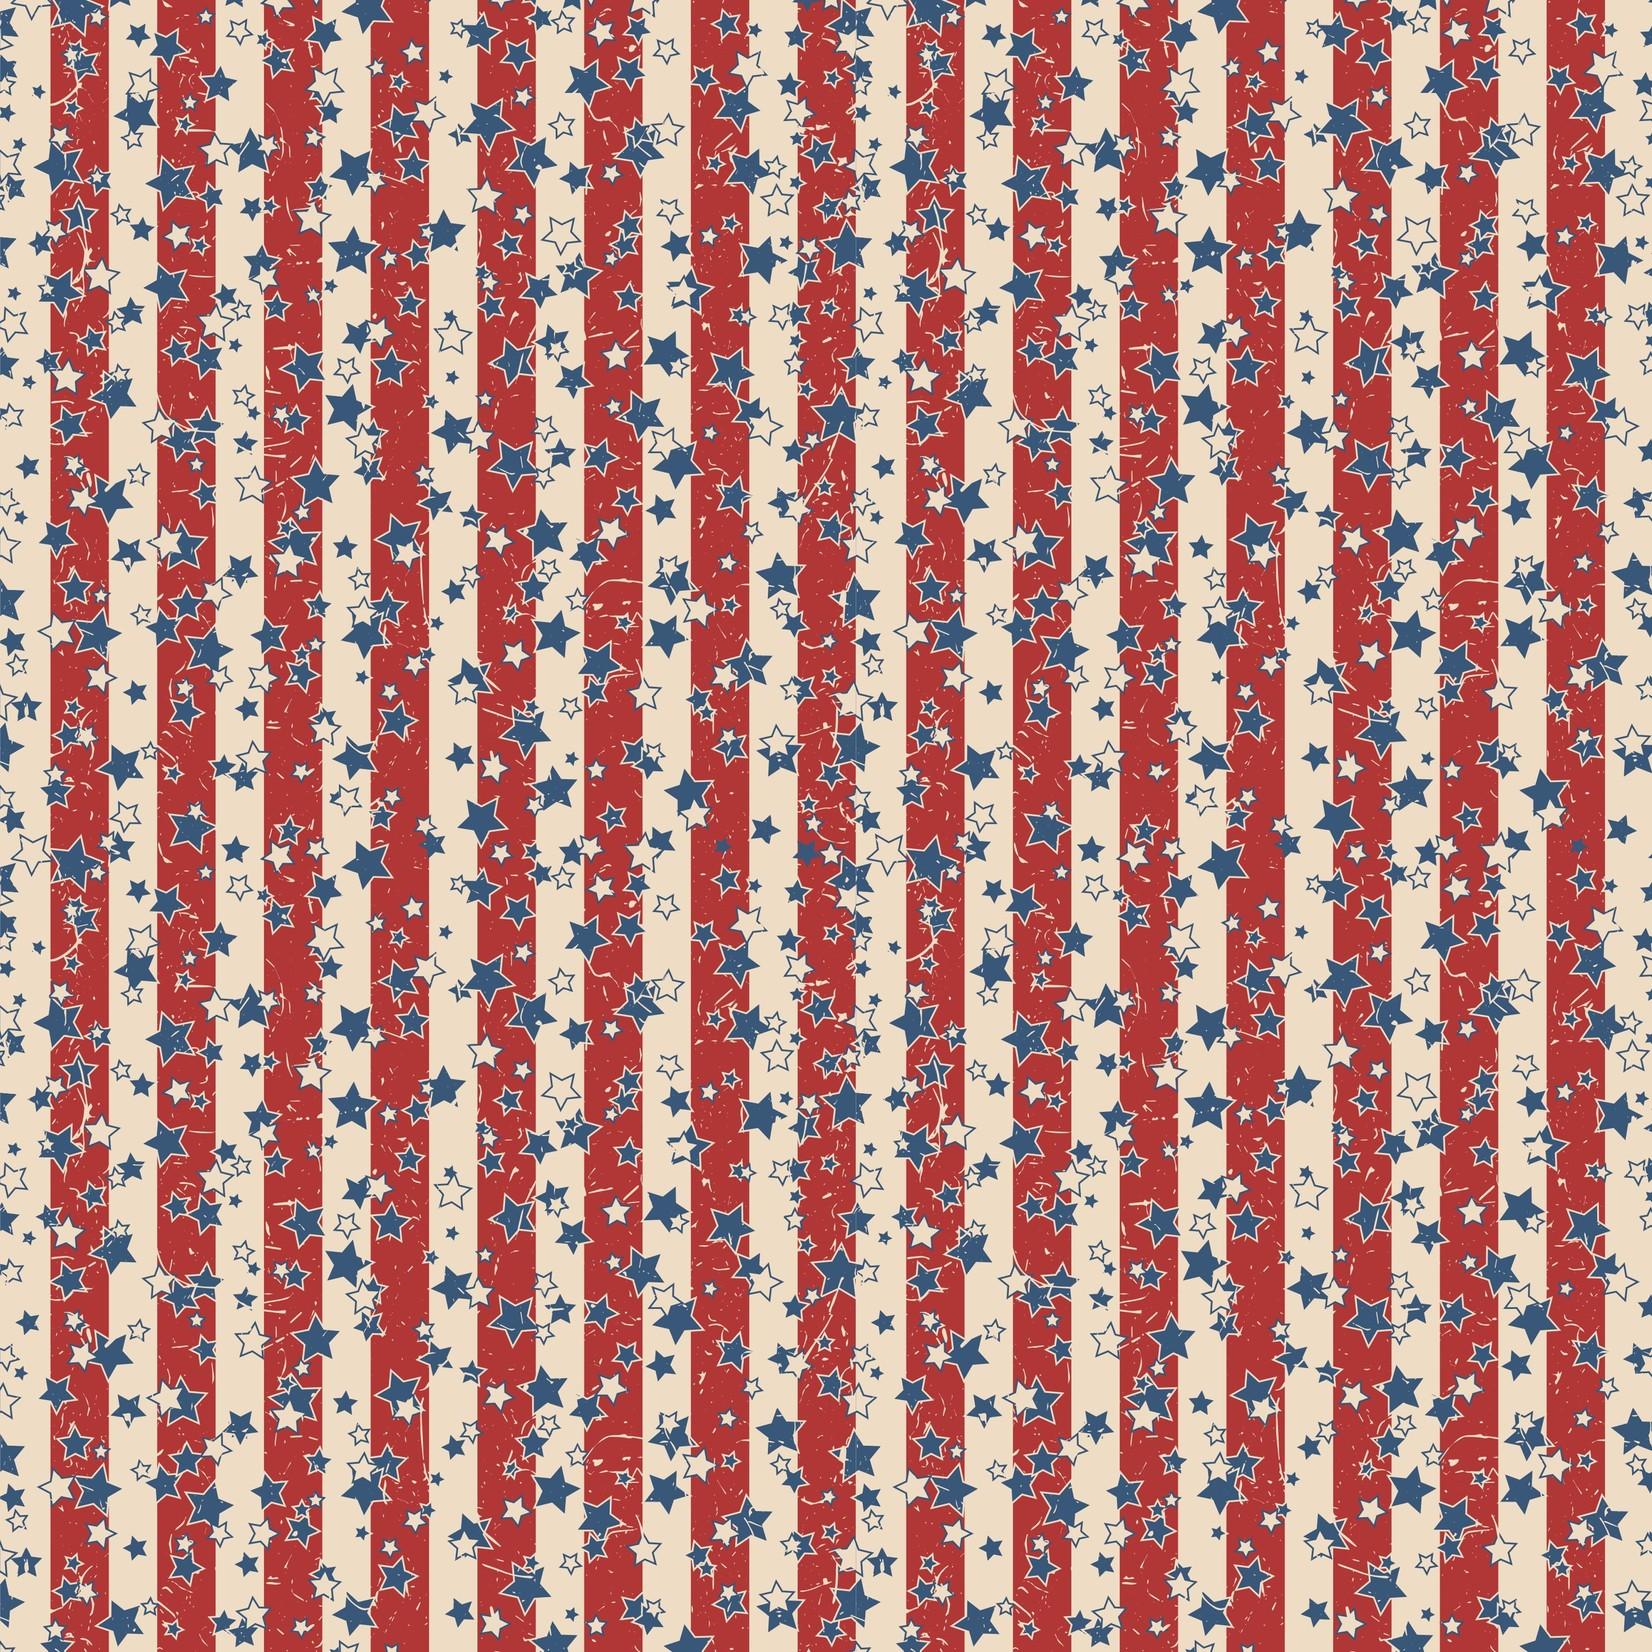 TVD Retro Stars and Stripes